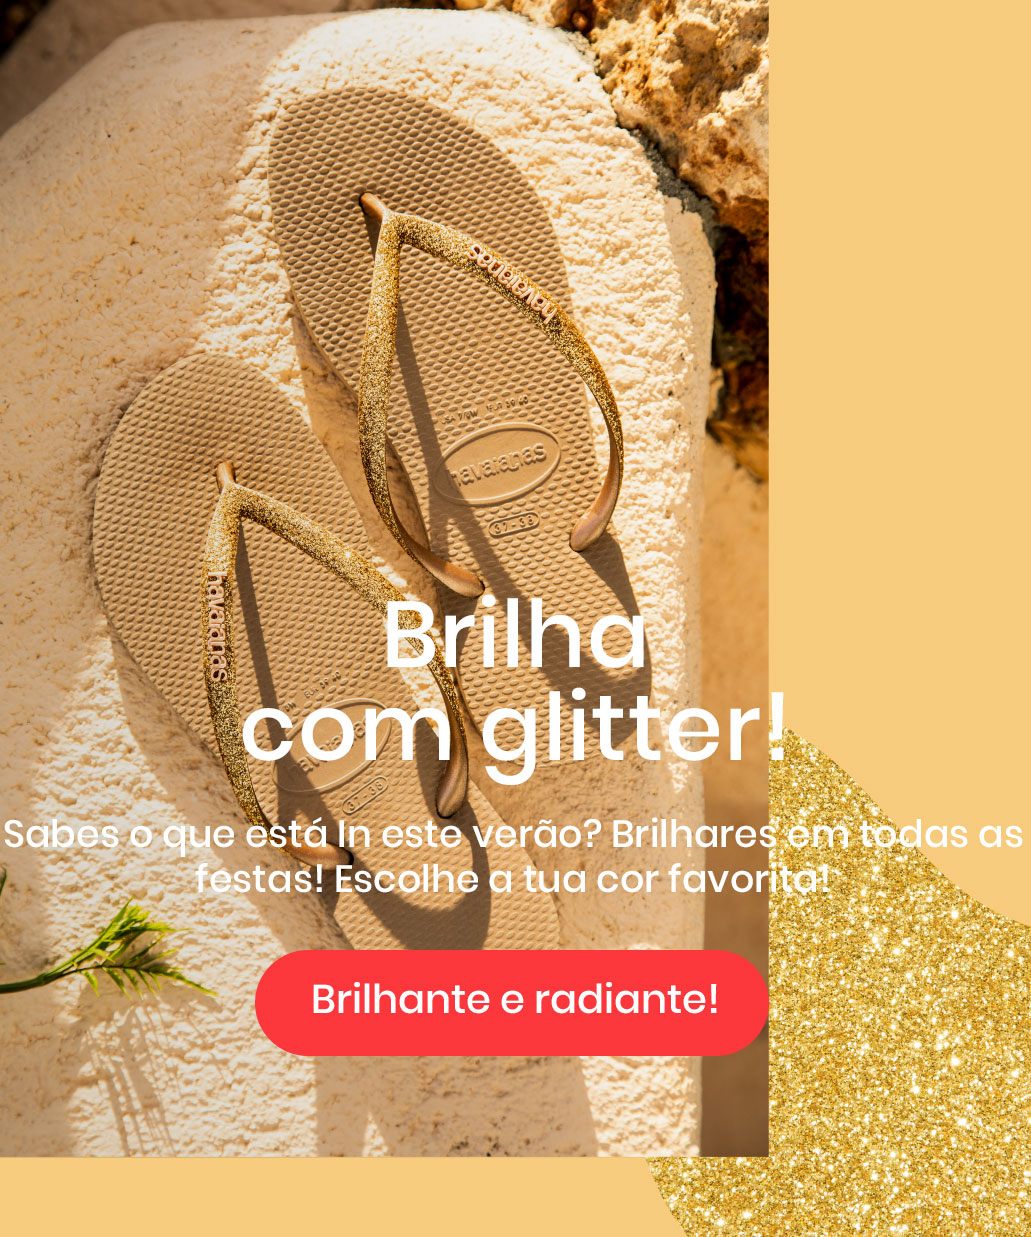 90d6c32d8 Chinelos Havaianas | Sua loja online Havaianas ® Portugal